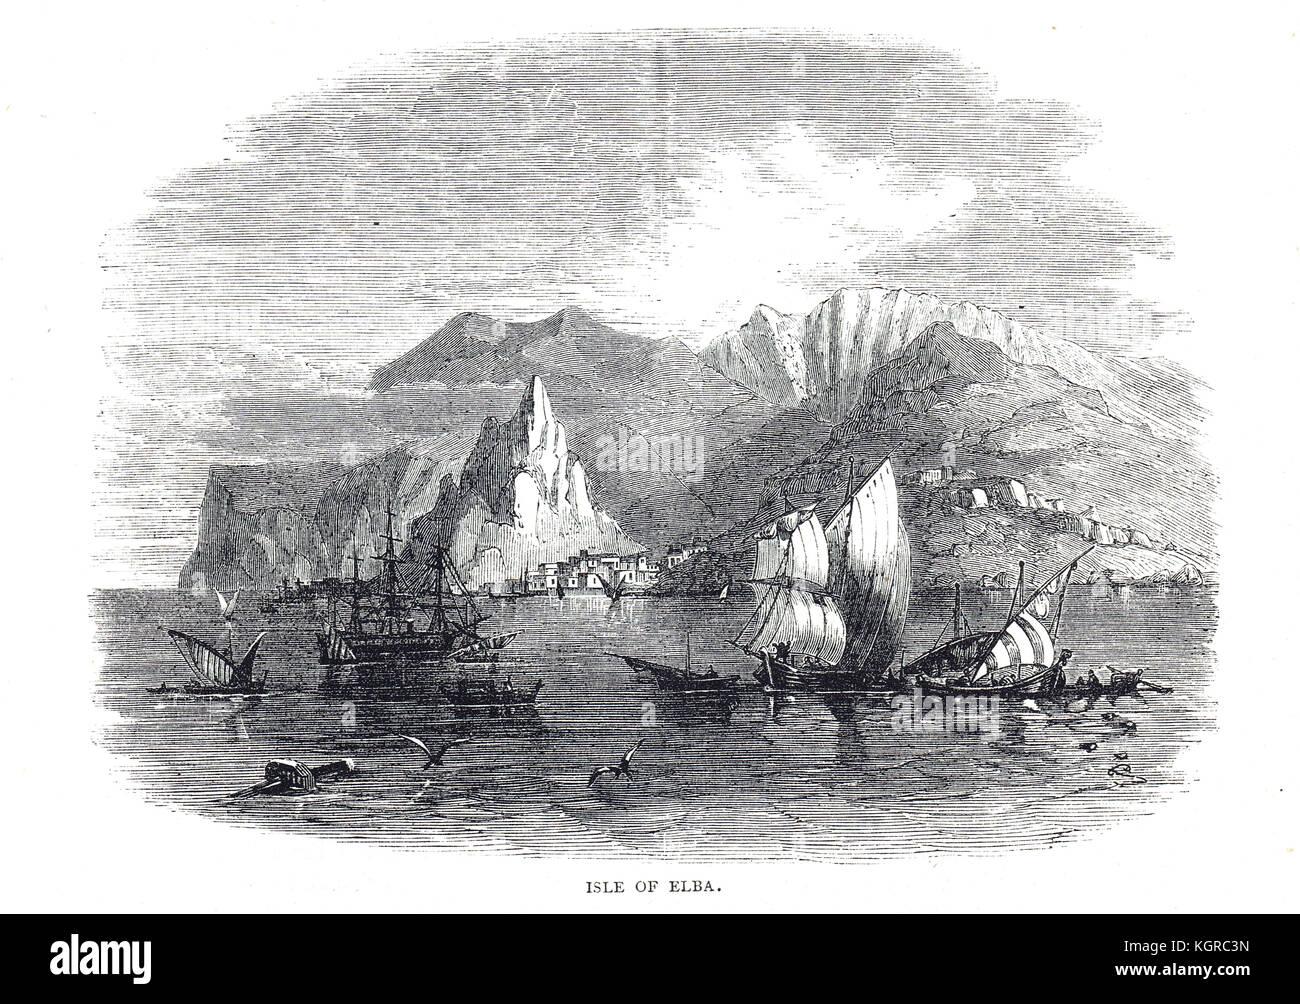 Isle of Elba, 19th century engraving - Stock Image